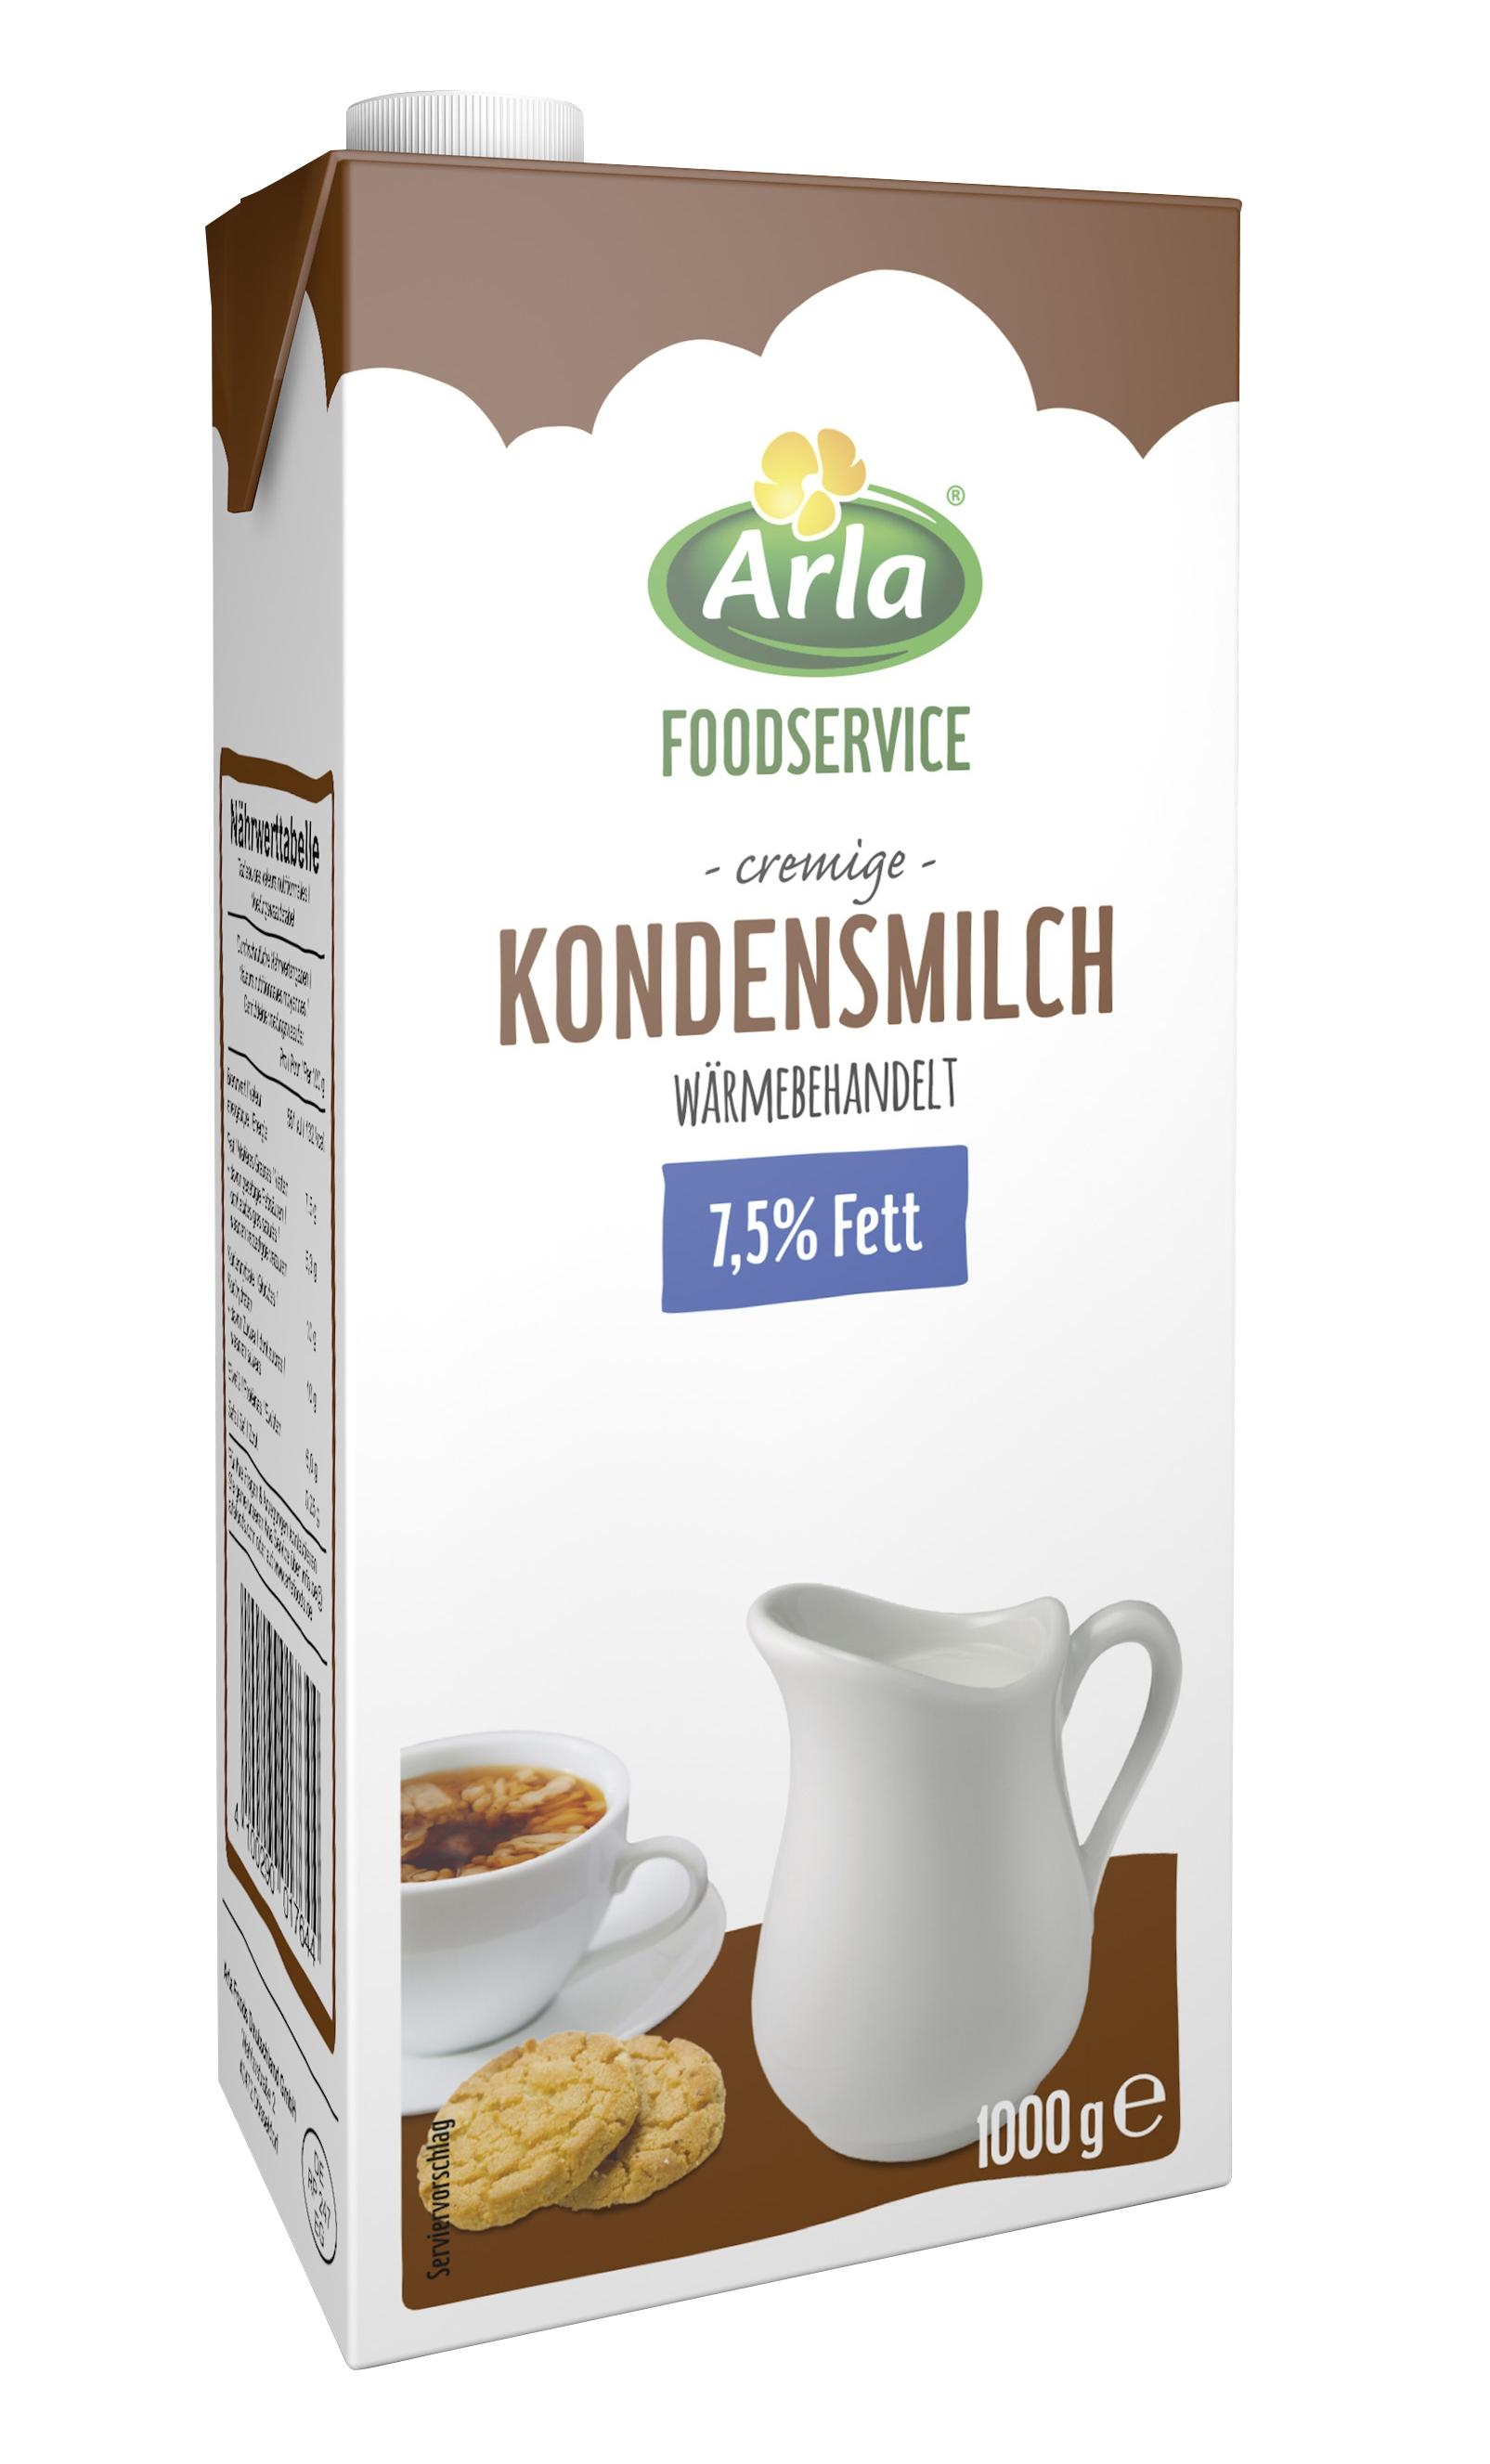 Arla Foodservice - Kondensmilch 7,5% 2016